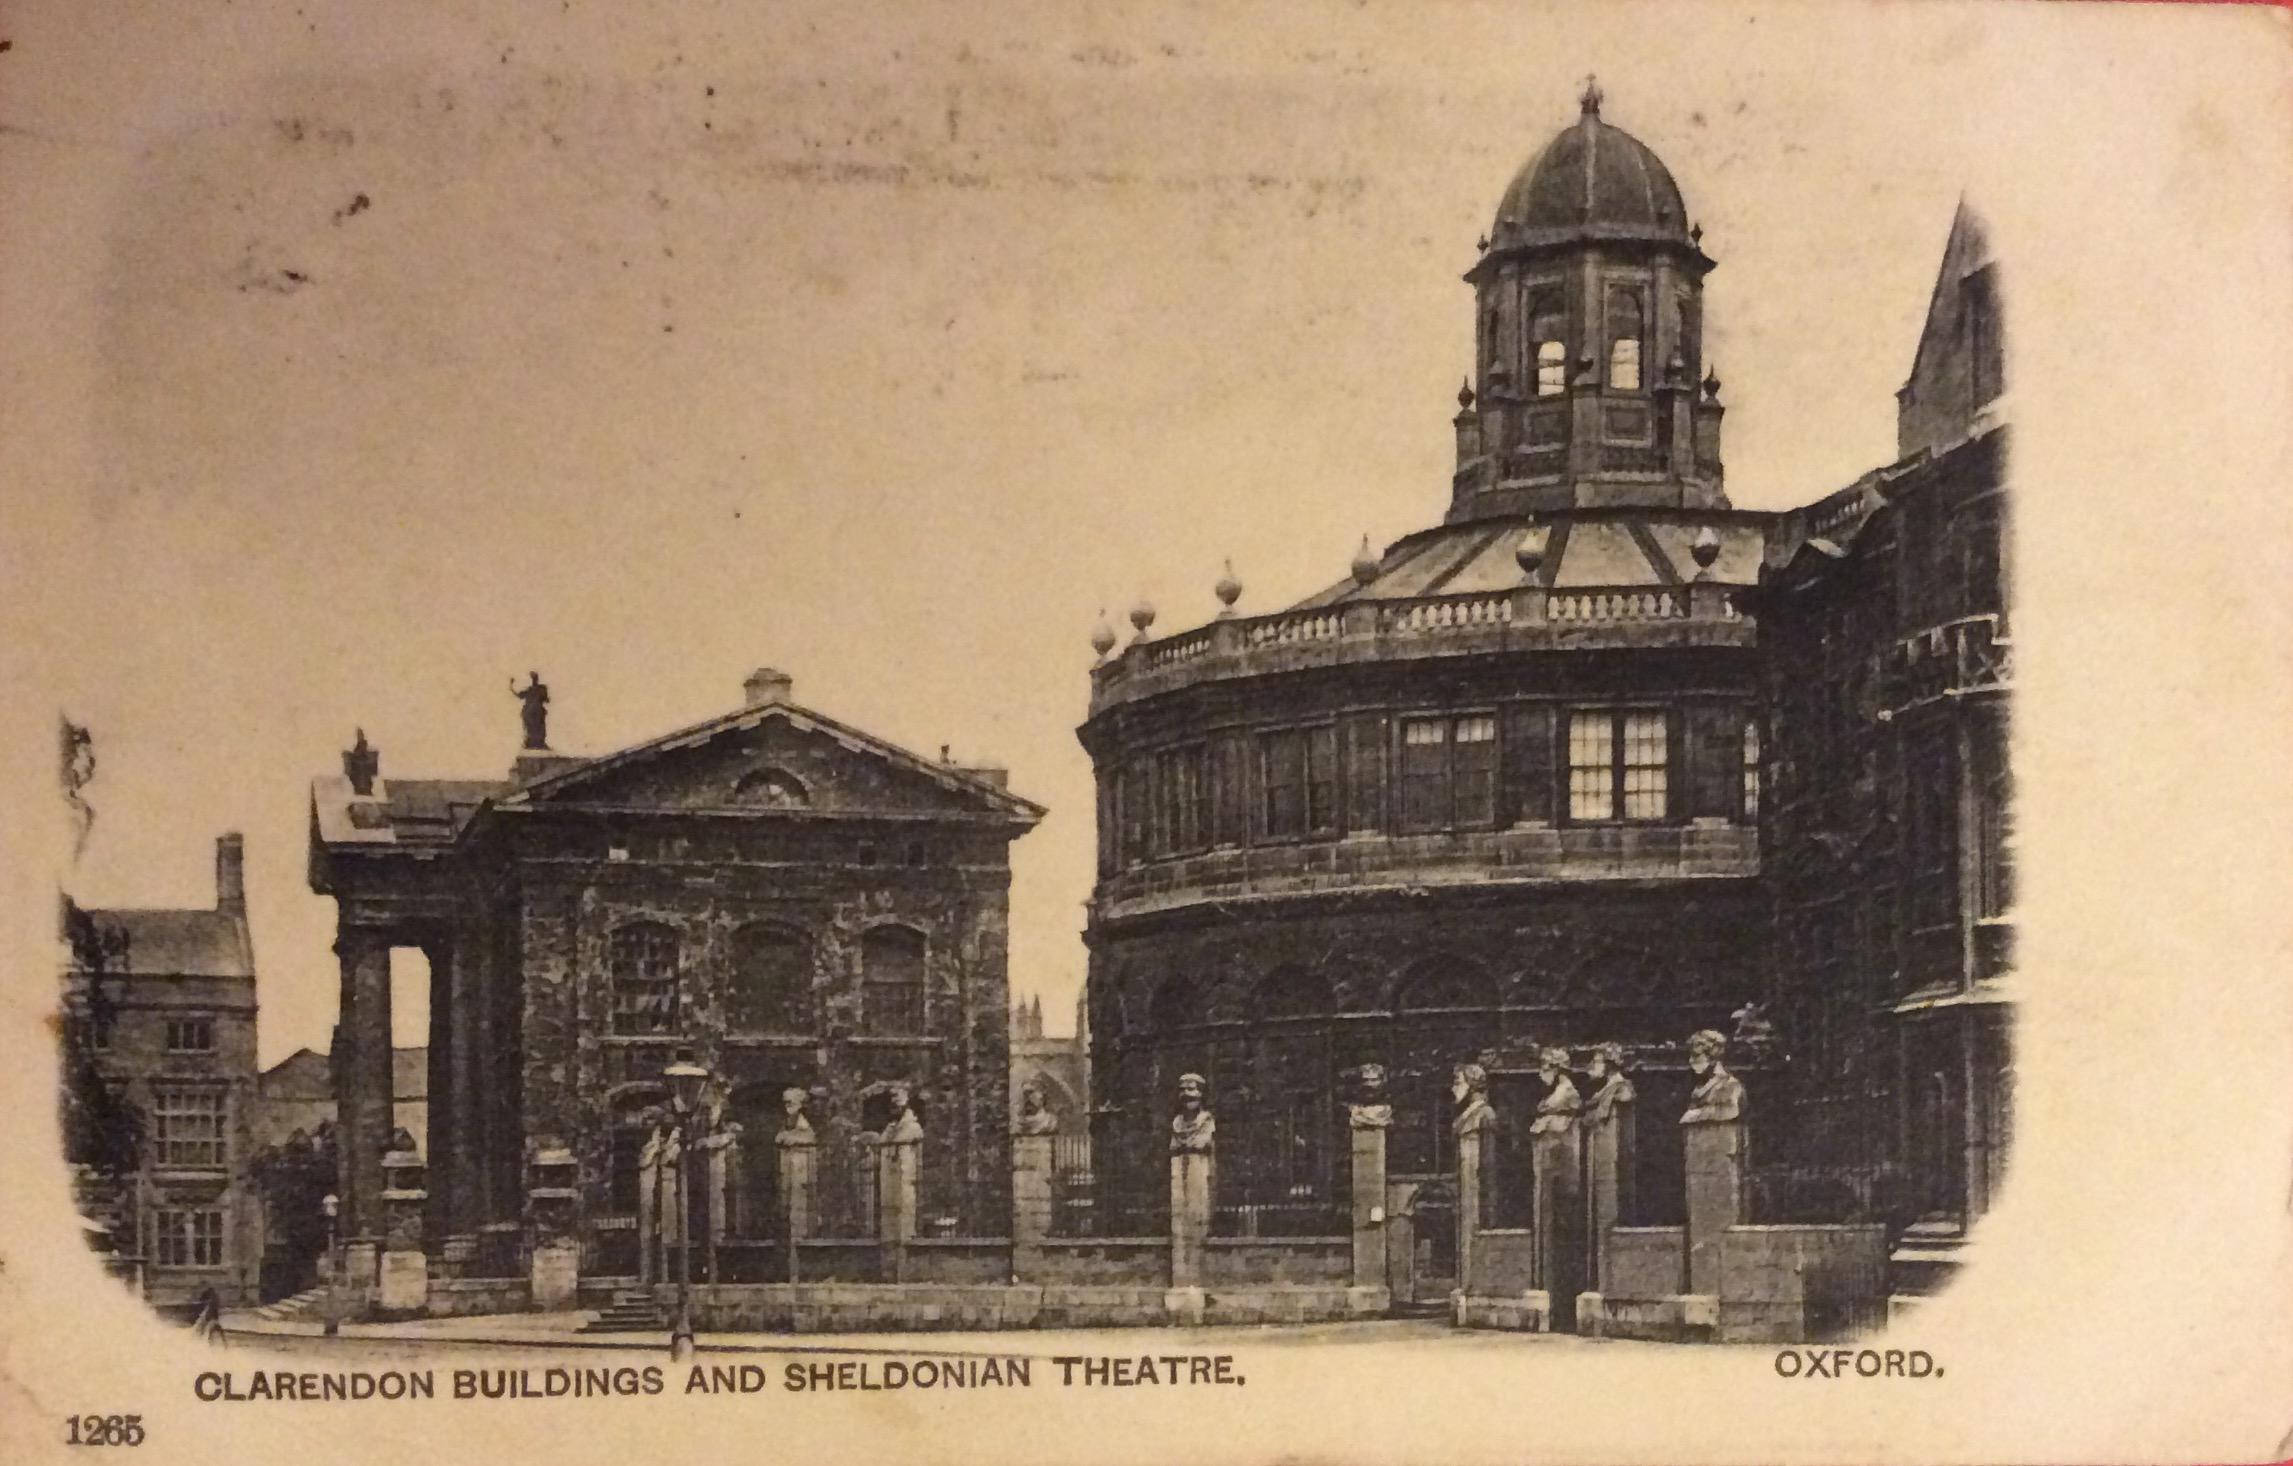 1905 Mirror writing sent to Isleworth